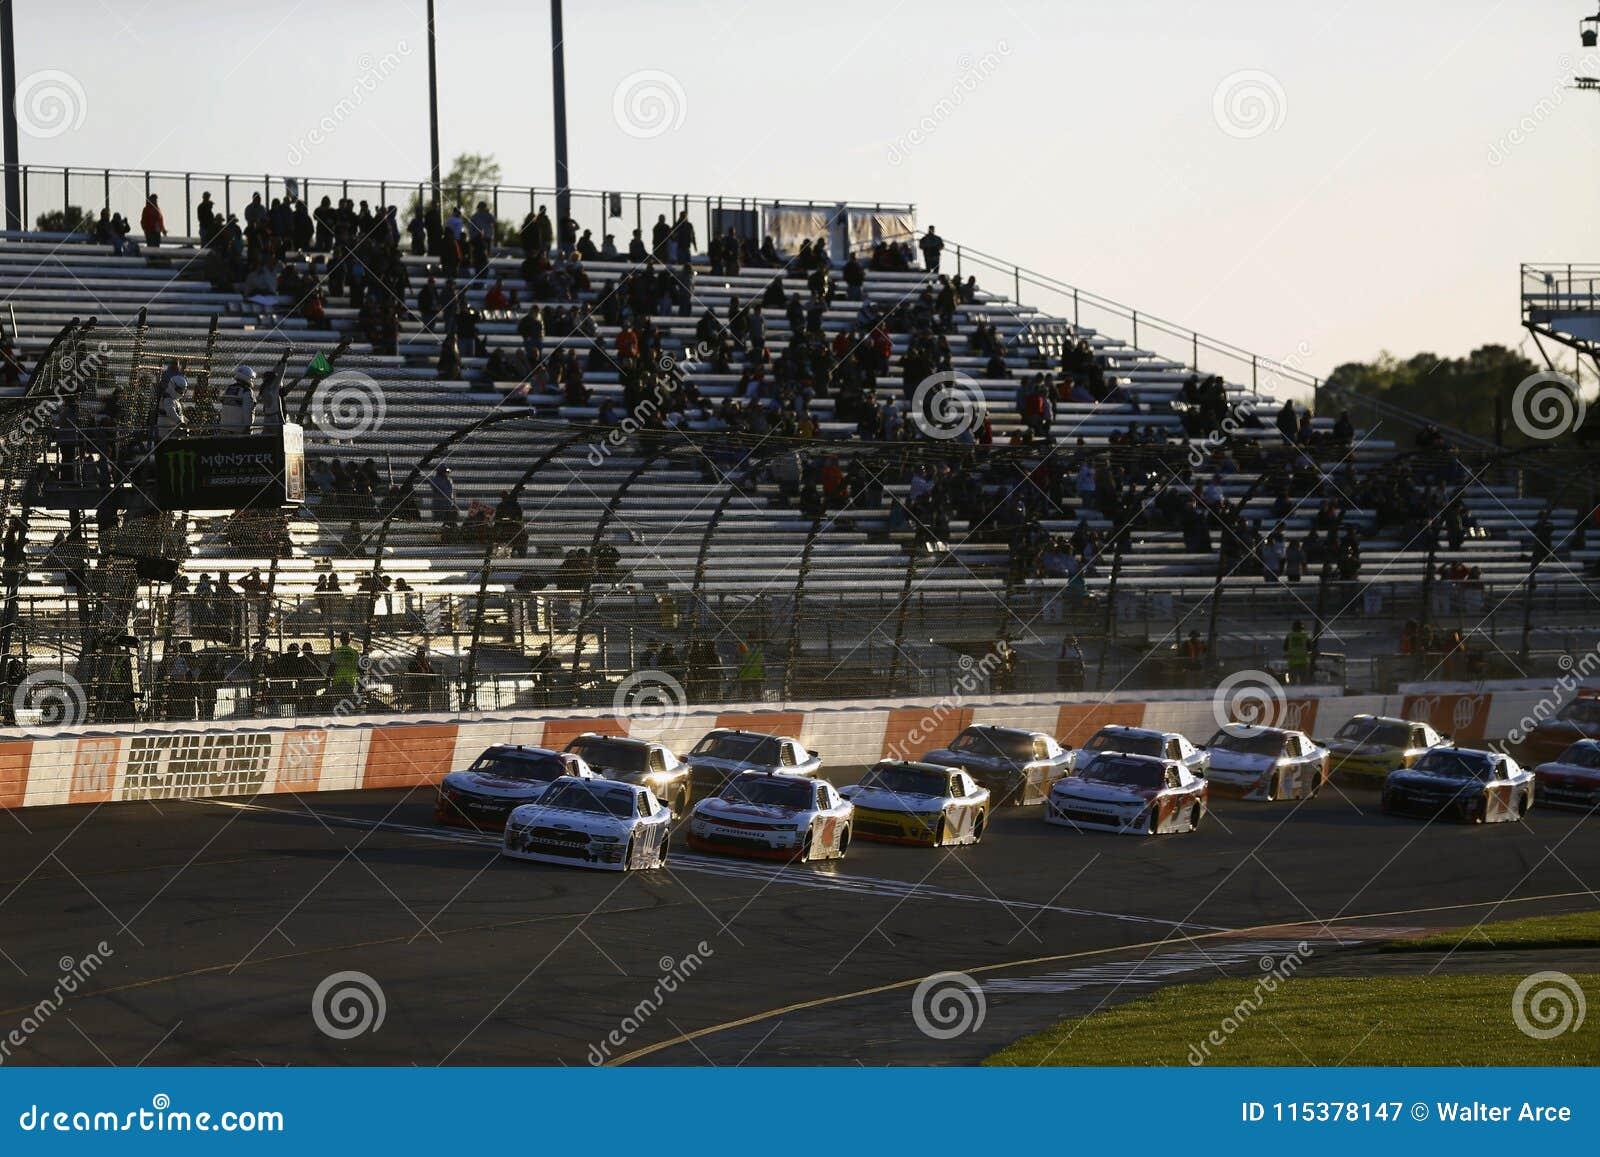 NASCAR: 20 aprile ToyotaCare 250